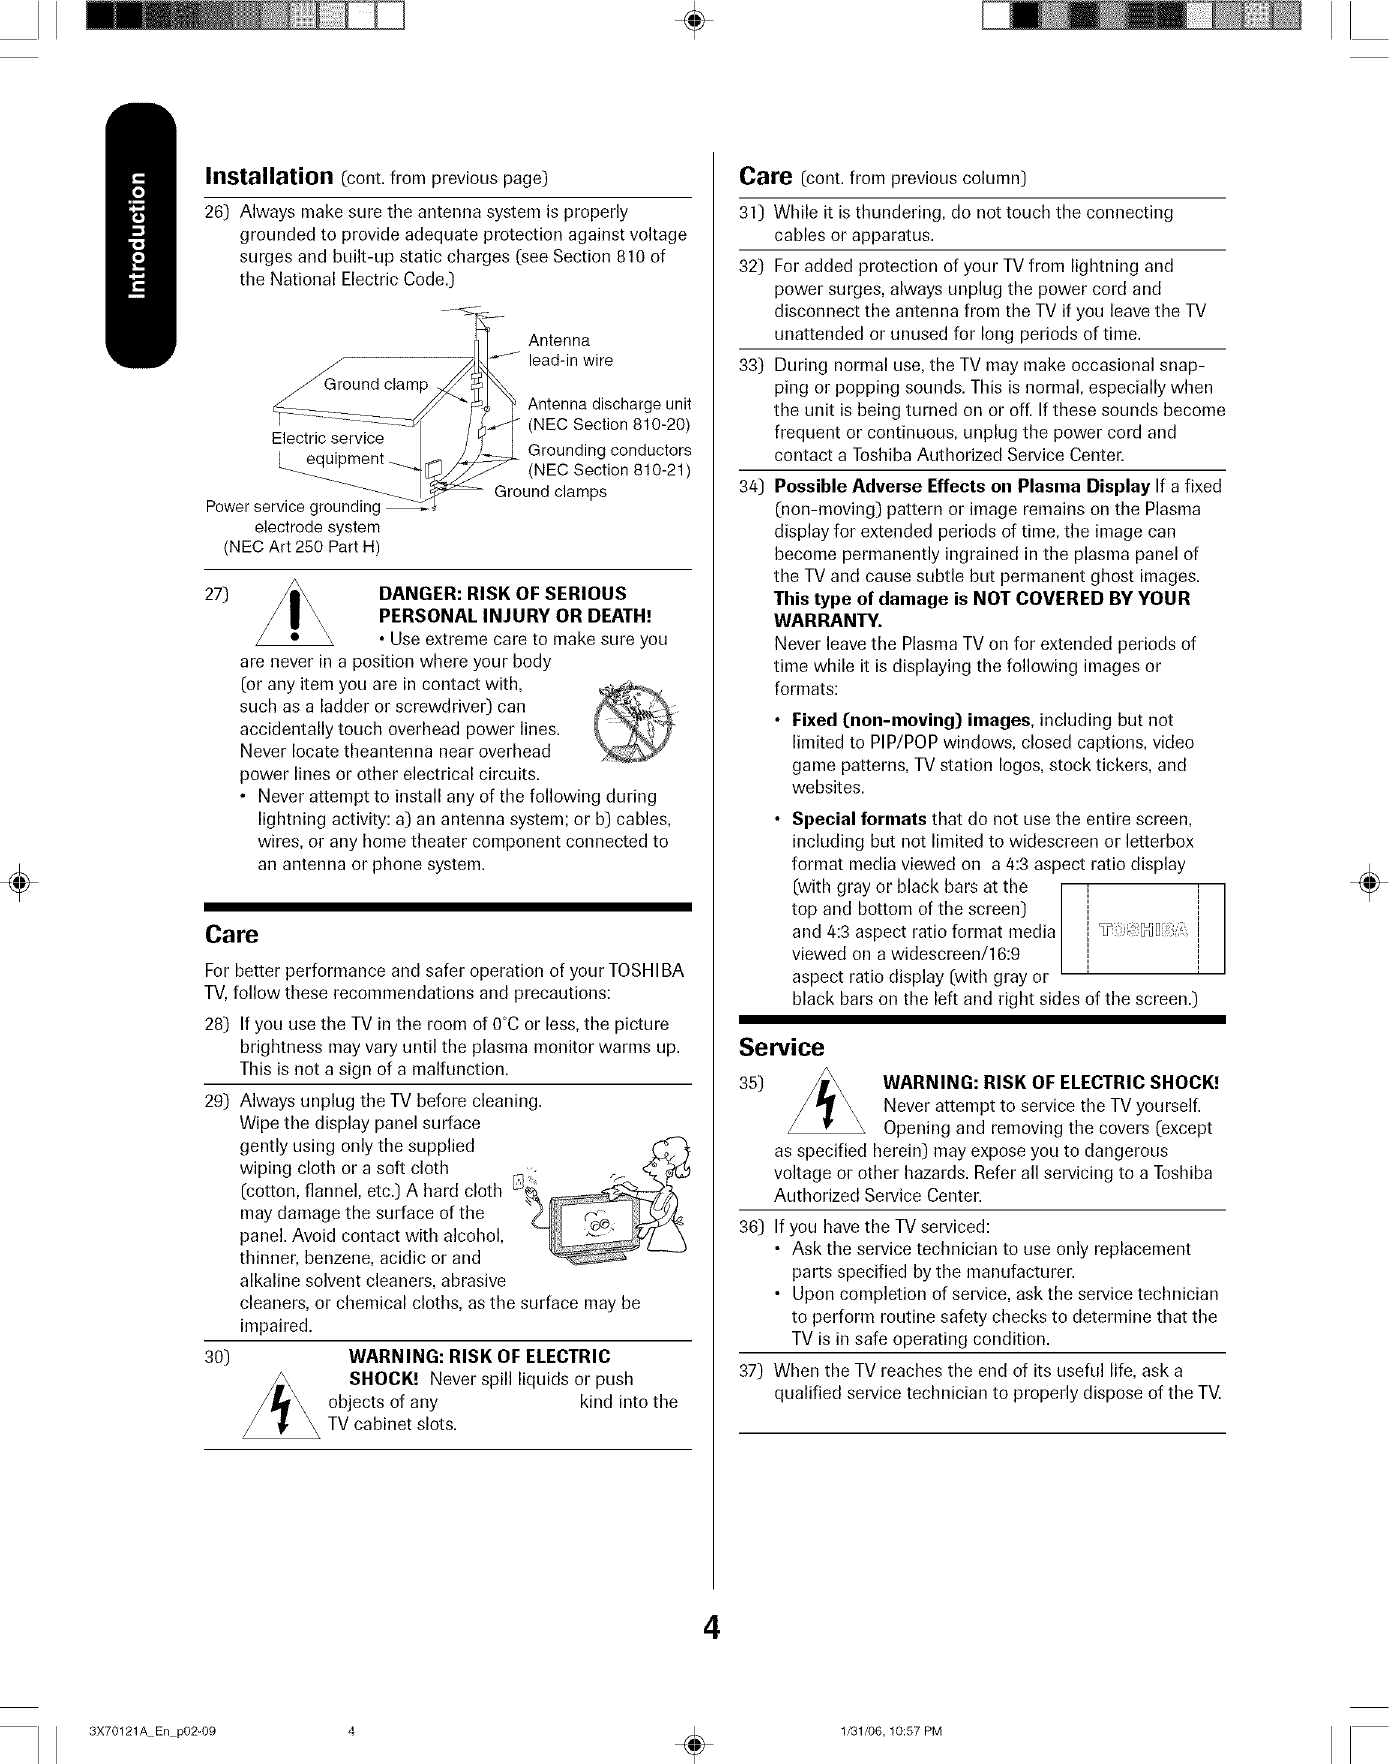 Toshiba 42HP66 User Manual PLASMA TELEVISION Manuals And